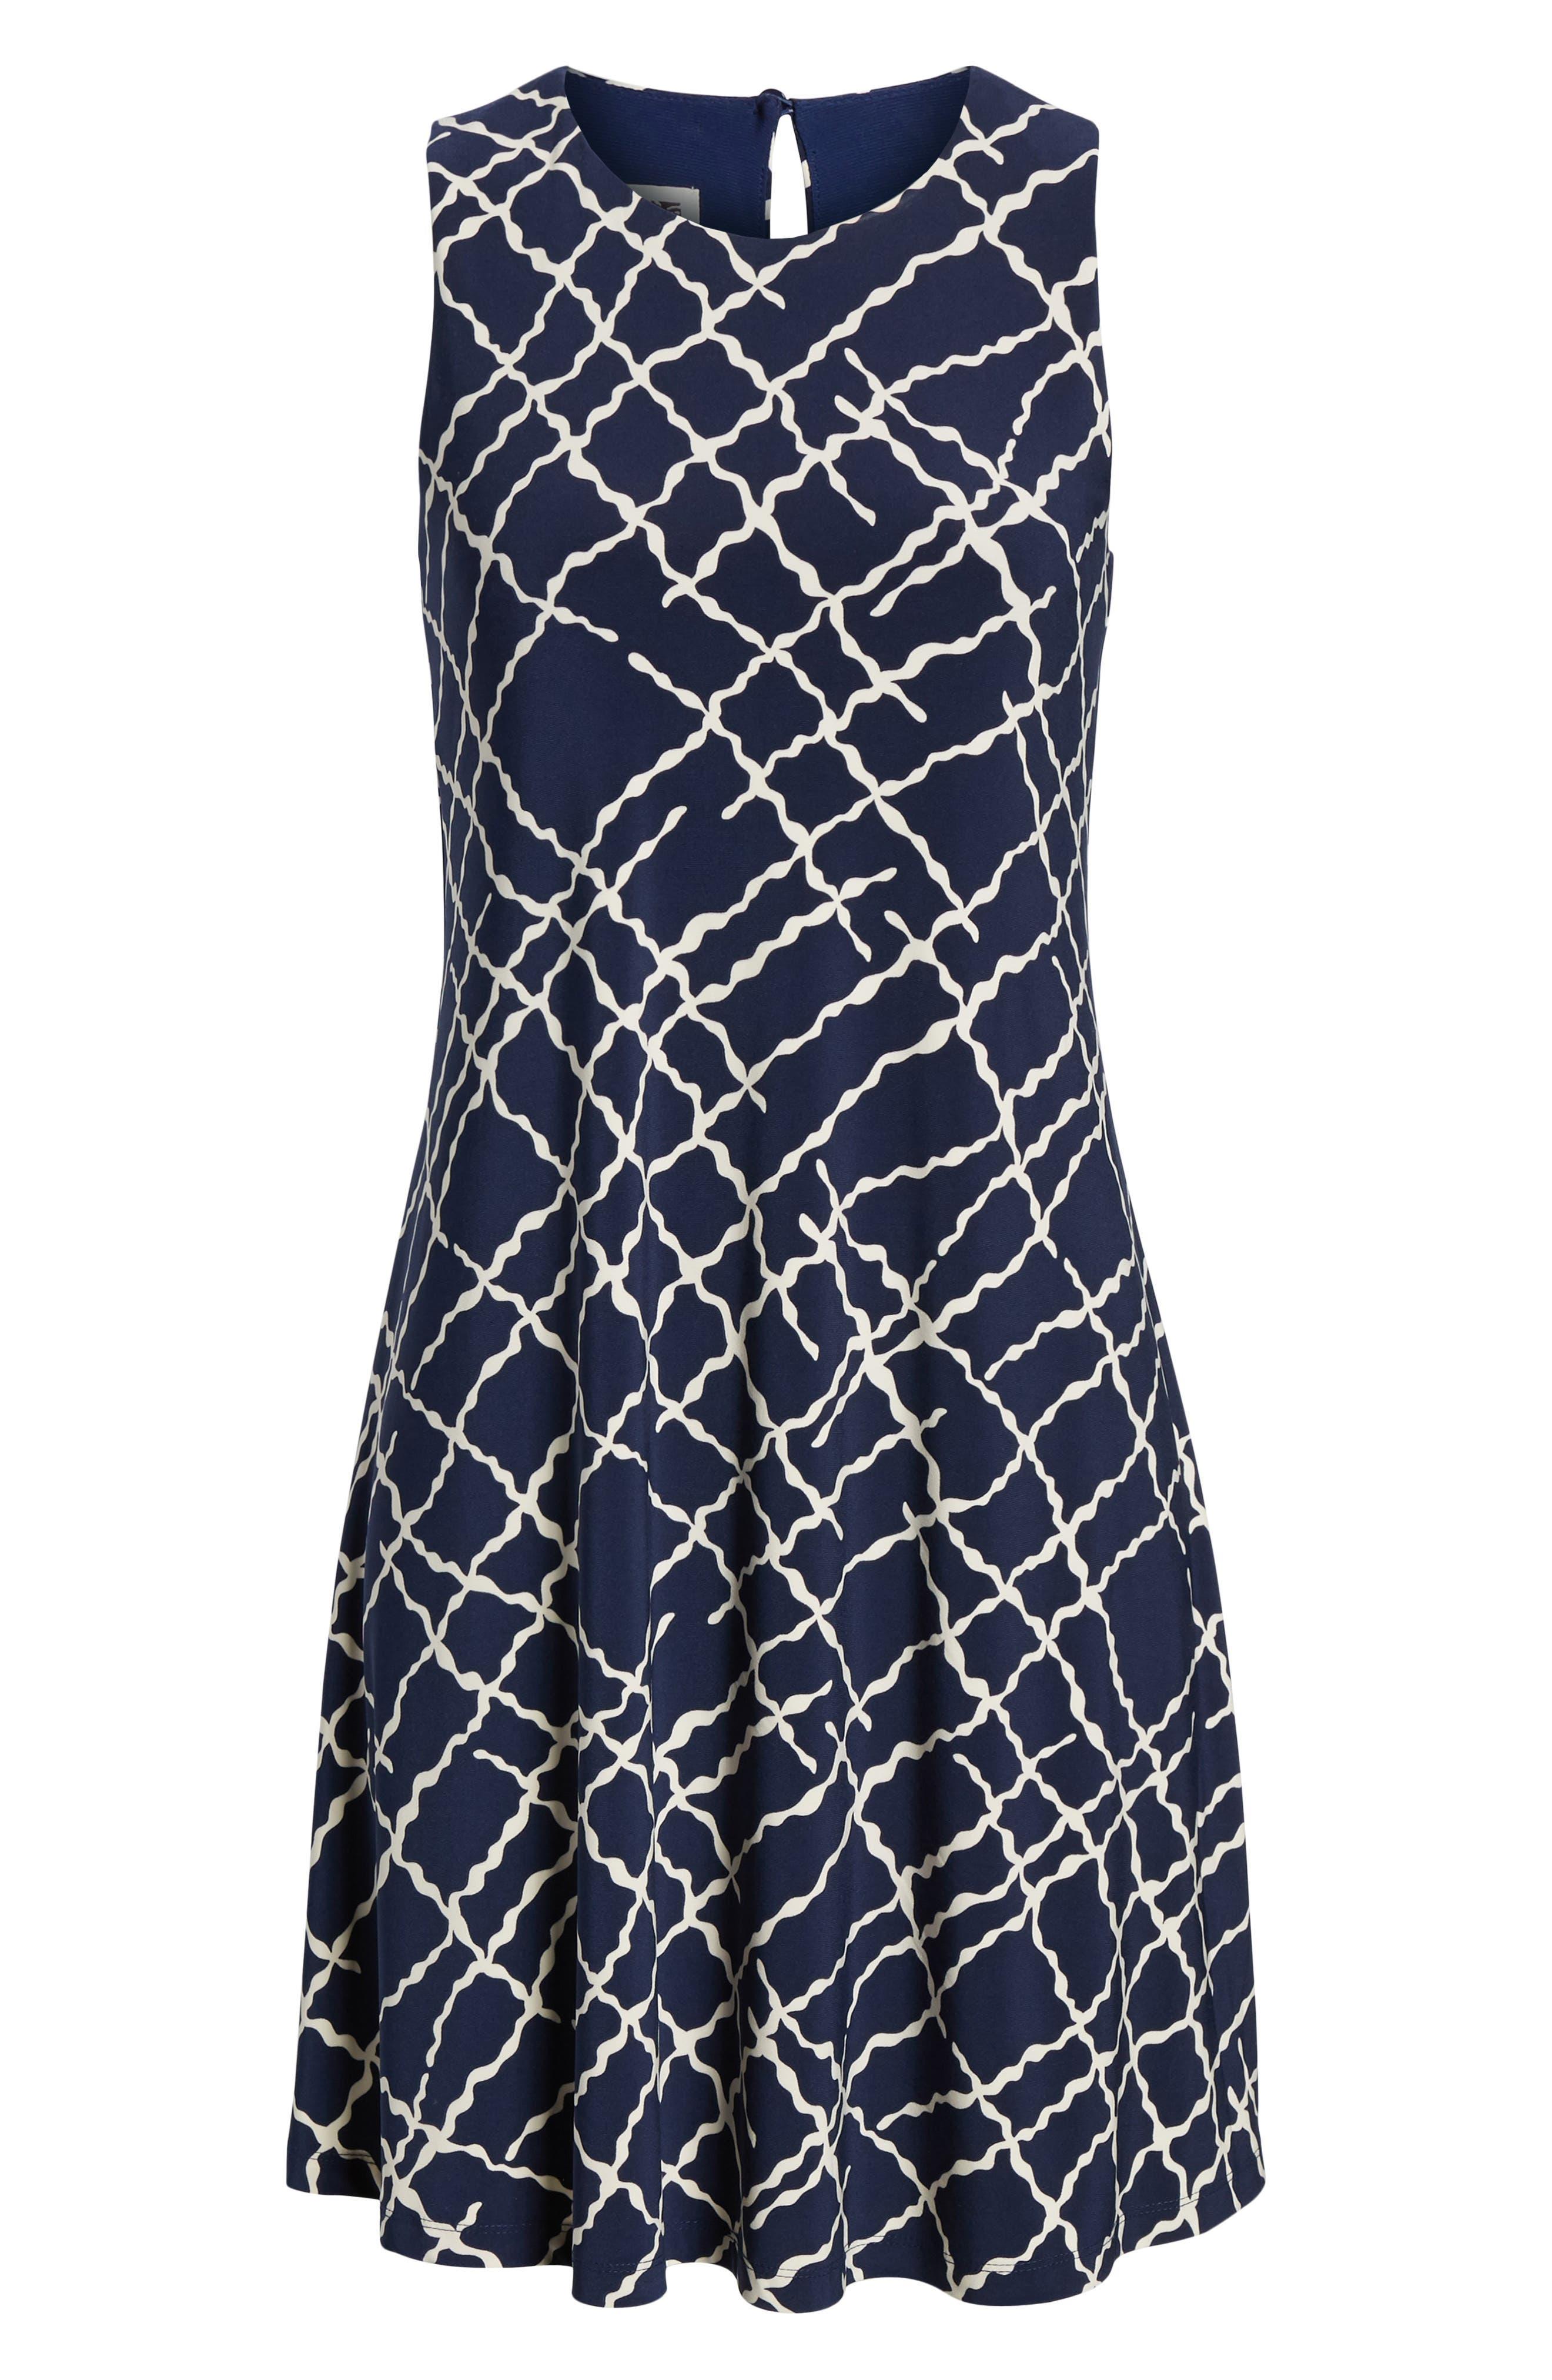 Print Swing Dress,                             Alternate thumbnail 7, color,                             Breton Blue/ Parchment